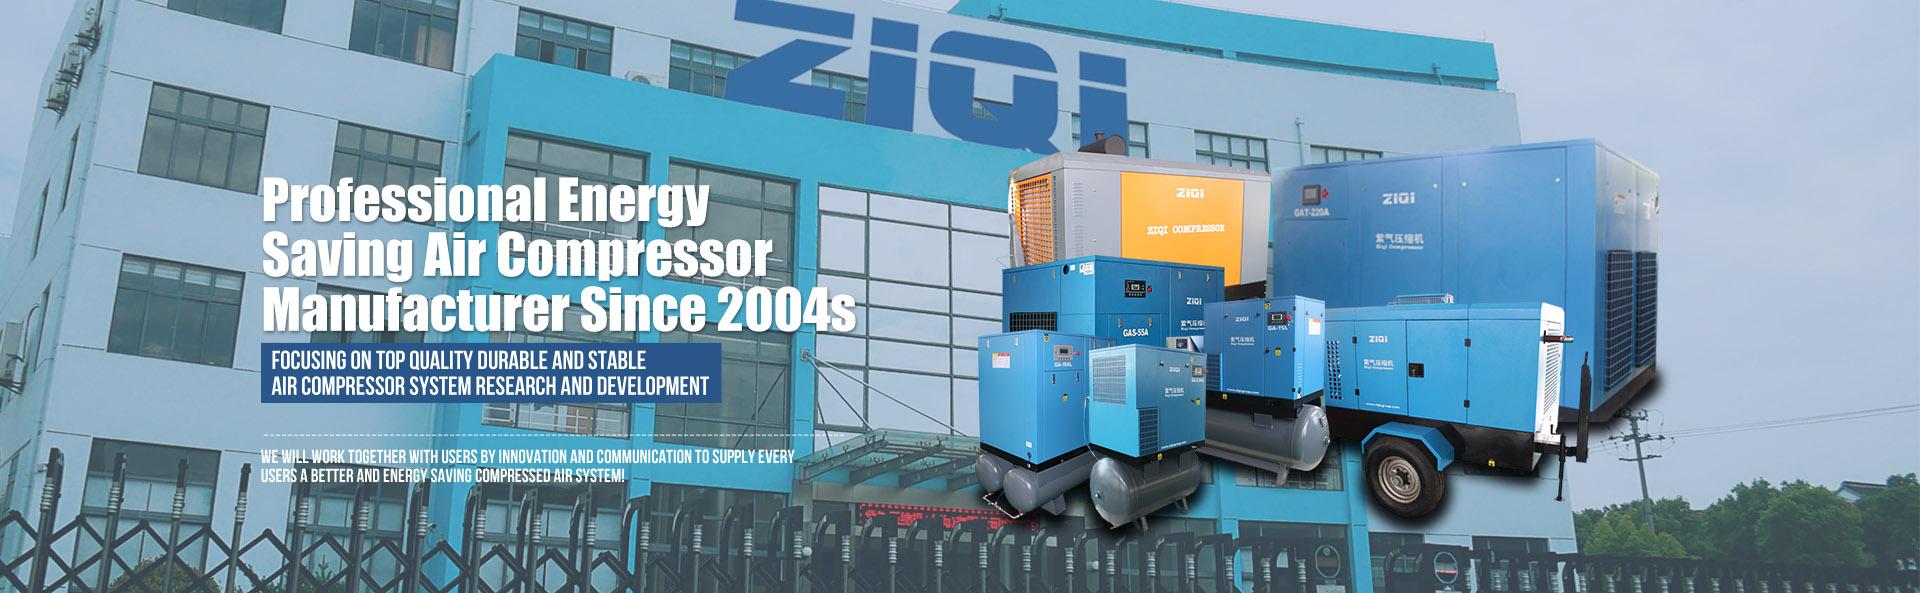 DENAIR Air Compressor Factory Image